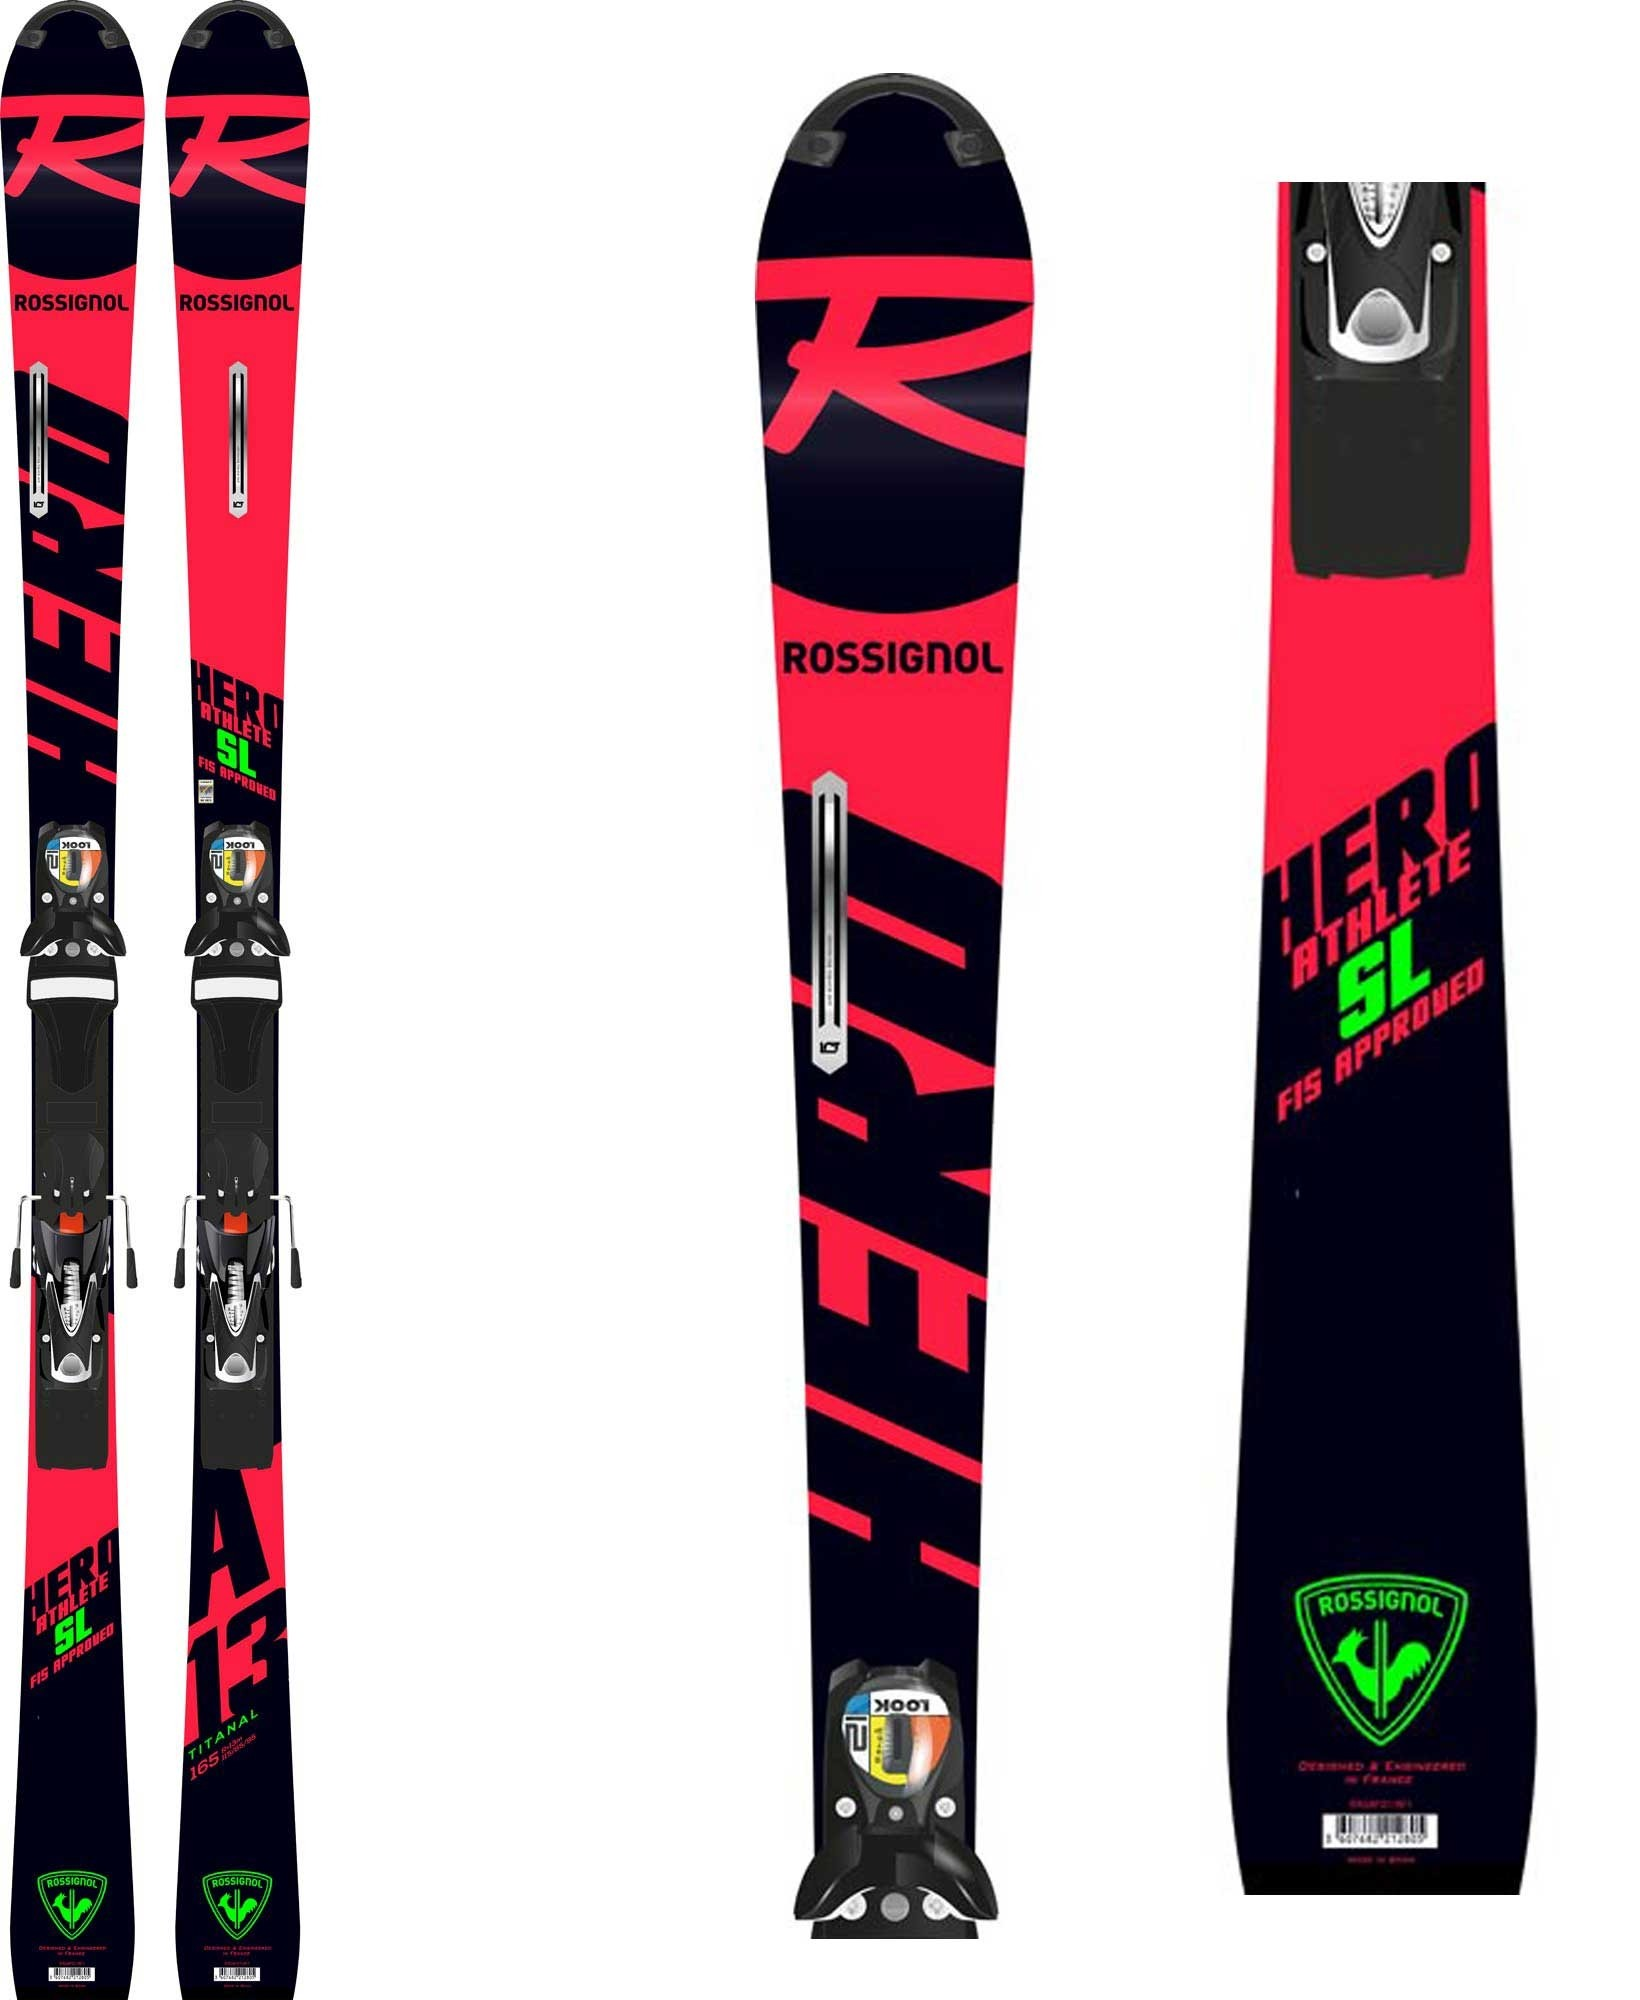 Rossignol skis Hero Athlete FIS SL (R22), 2019